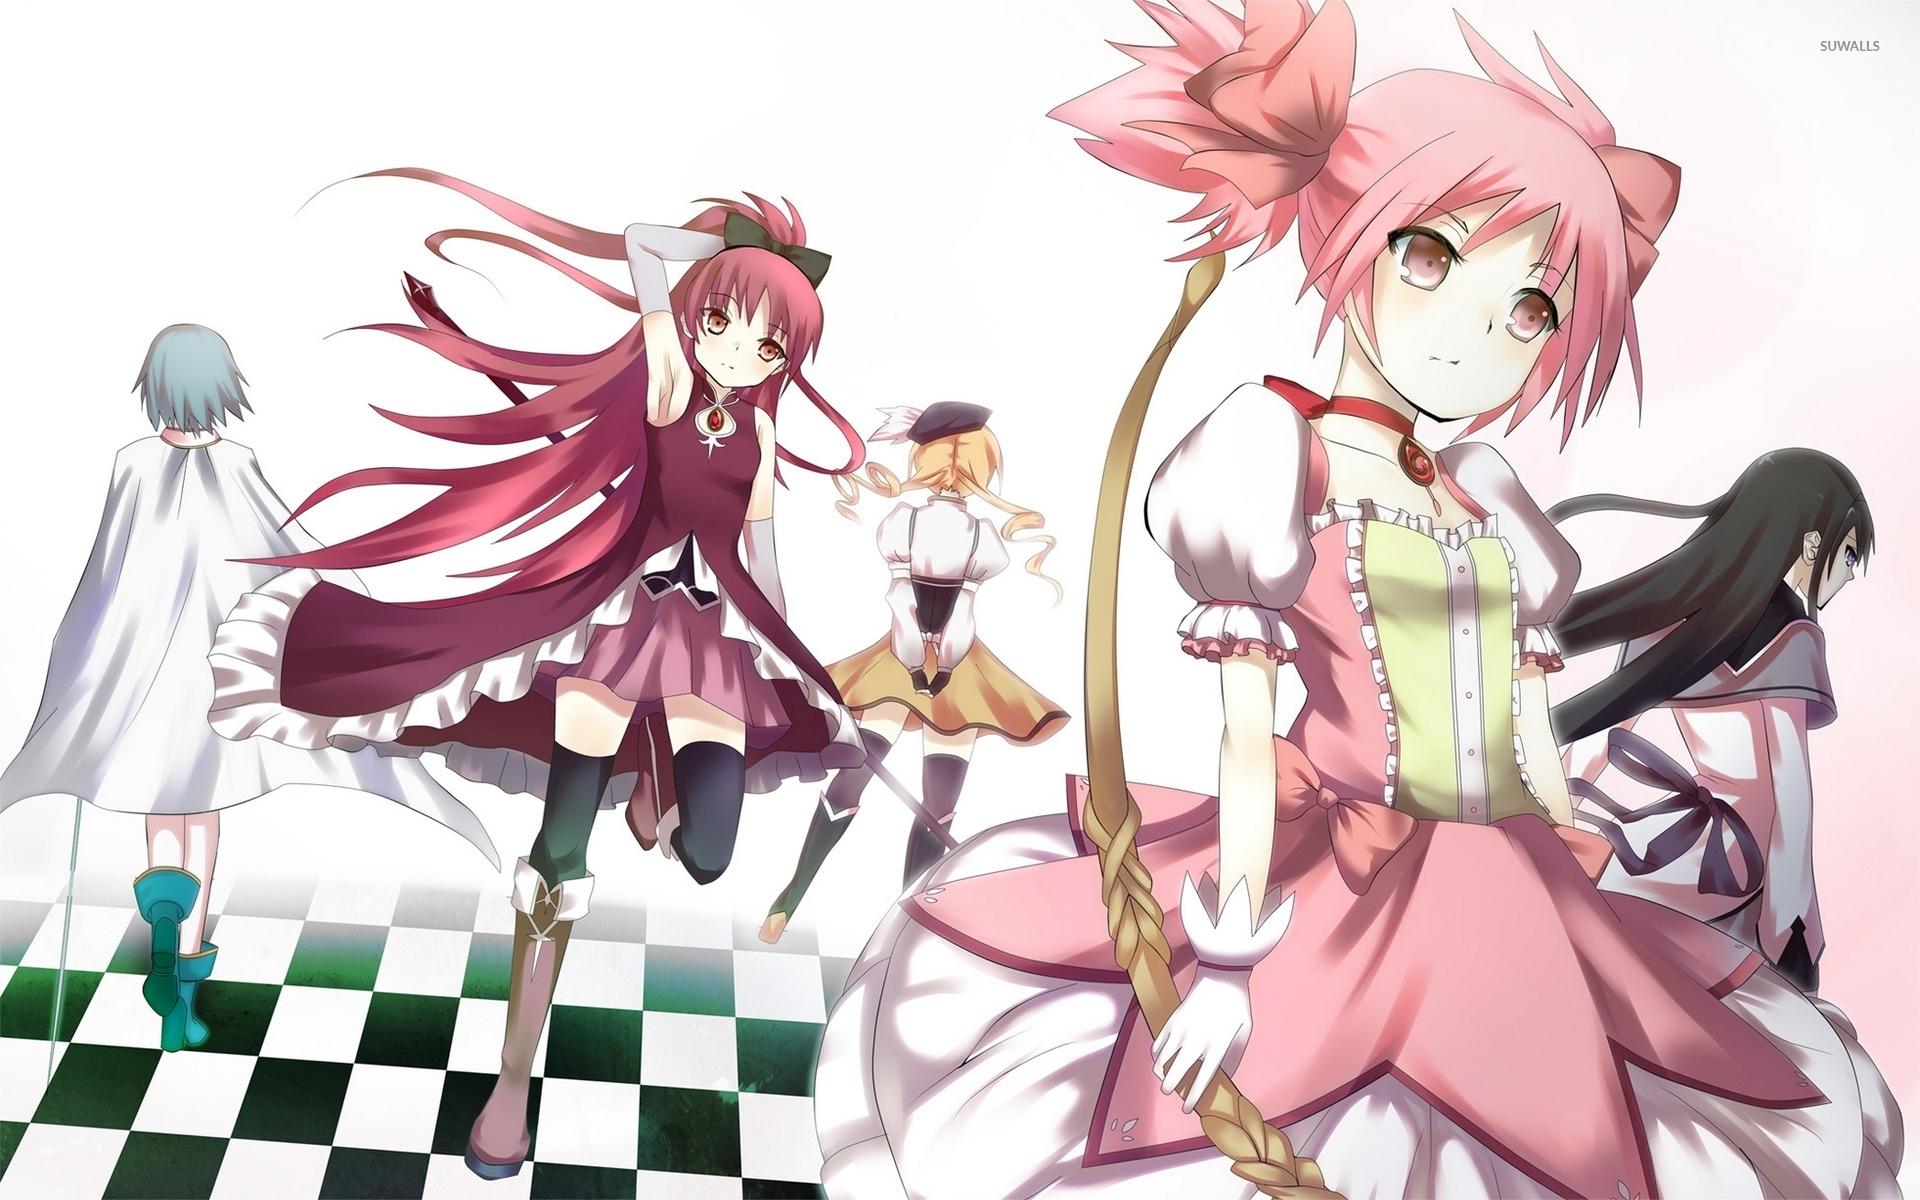 Puella Magi Madoka Magica Characters Wallpaper Anime Wallpapers 54578